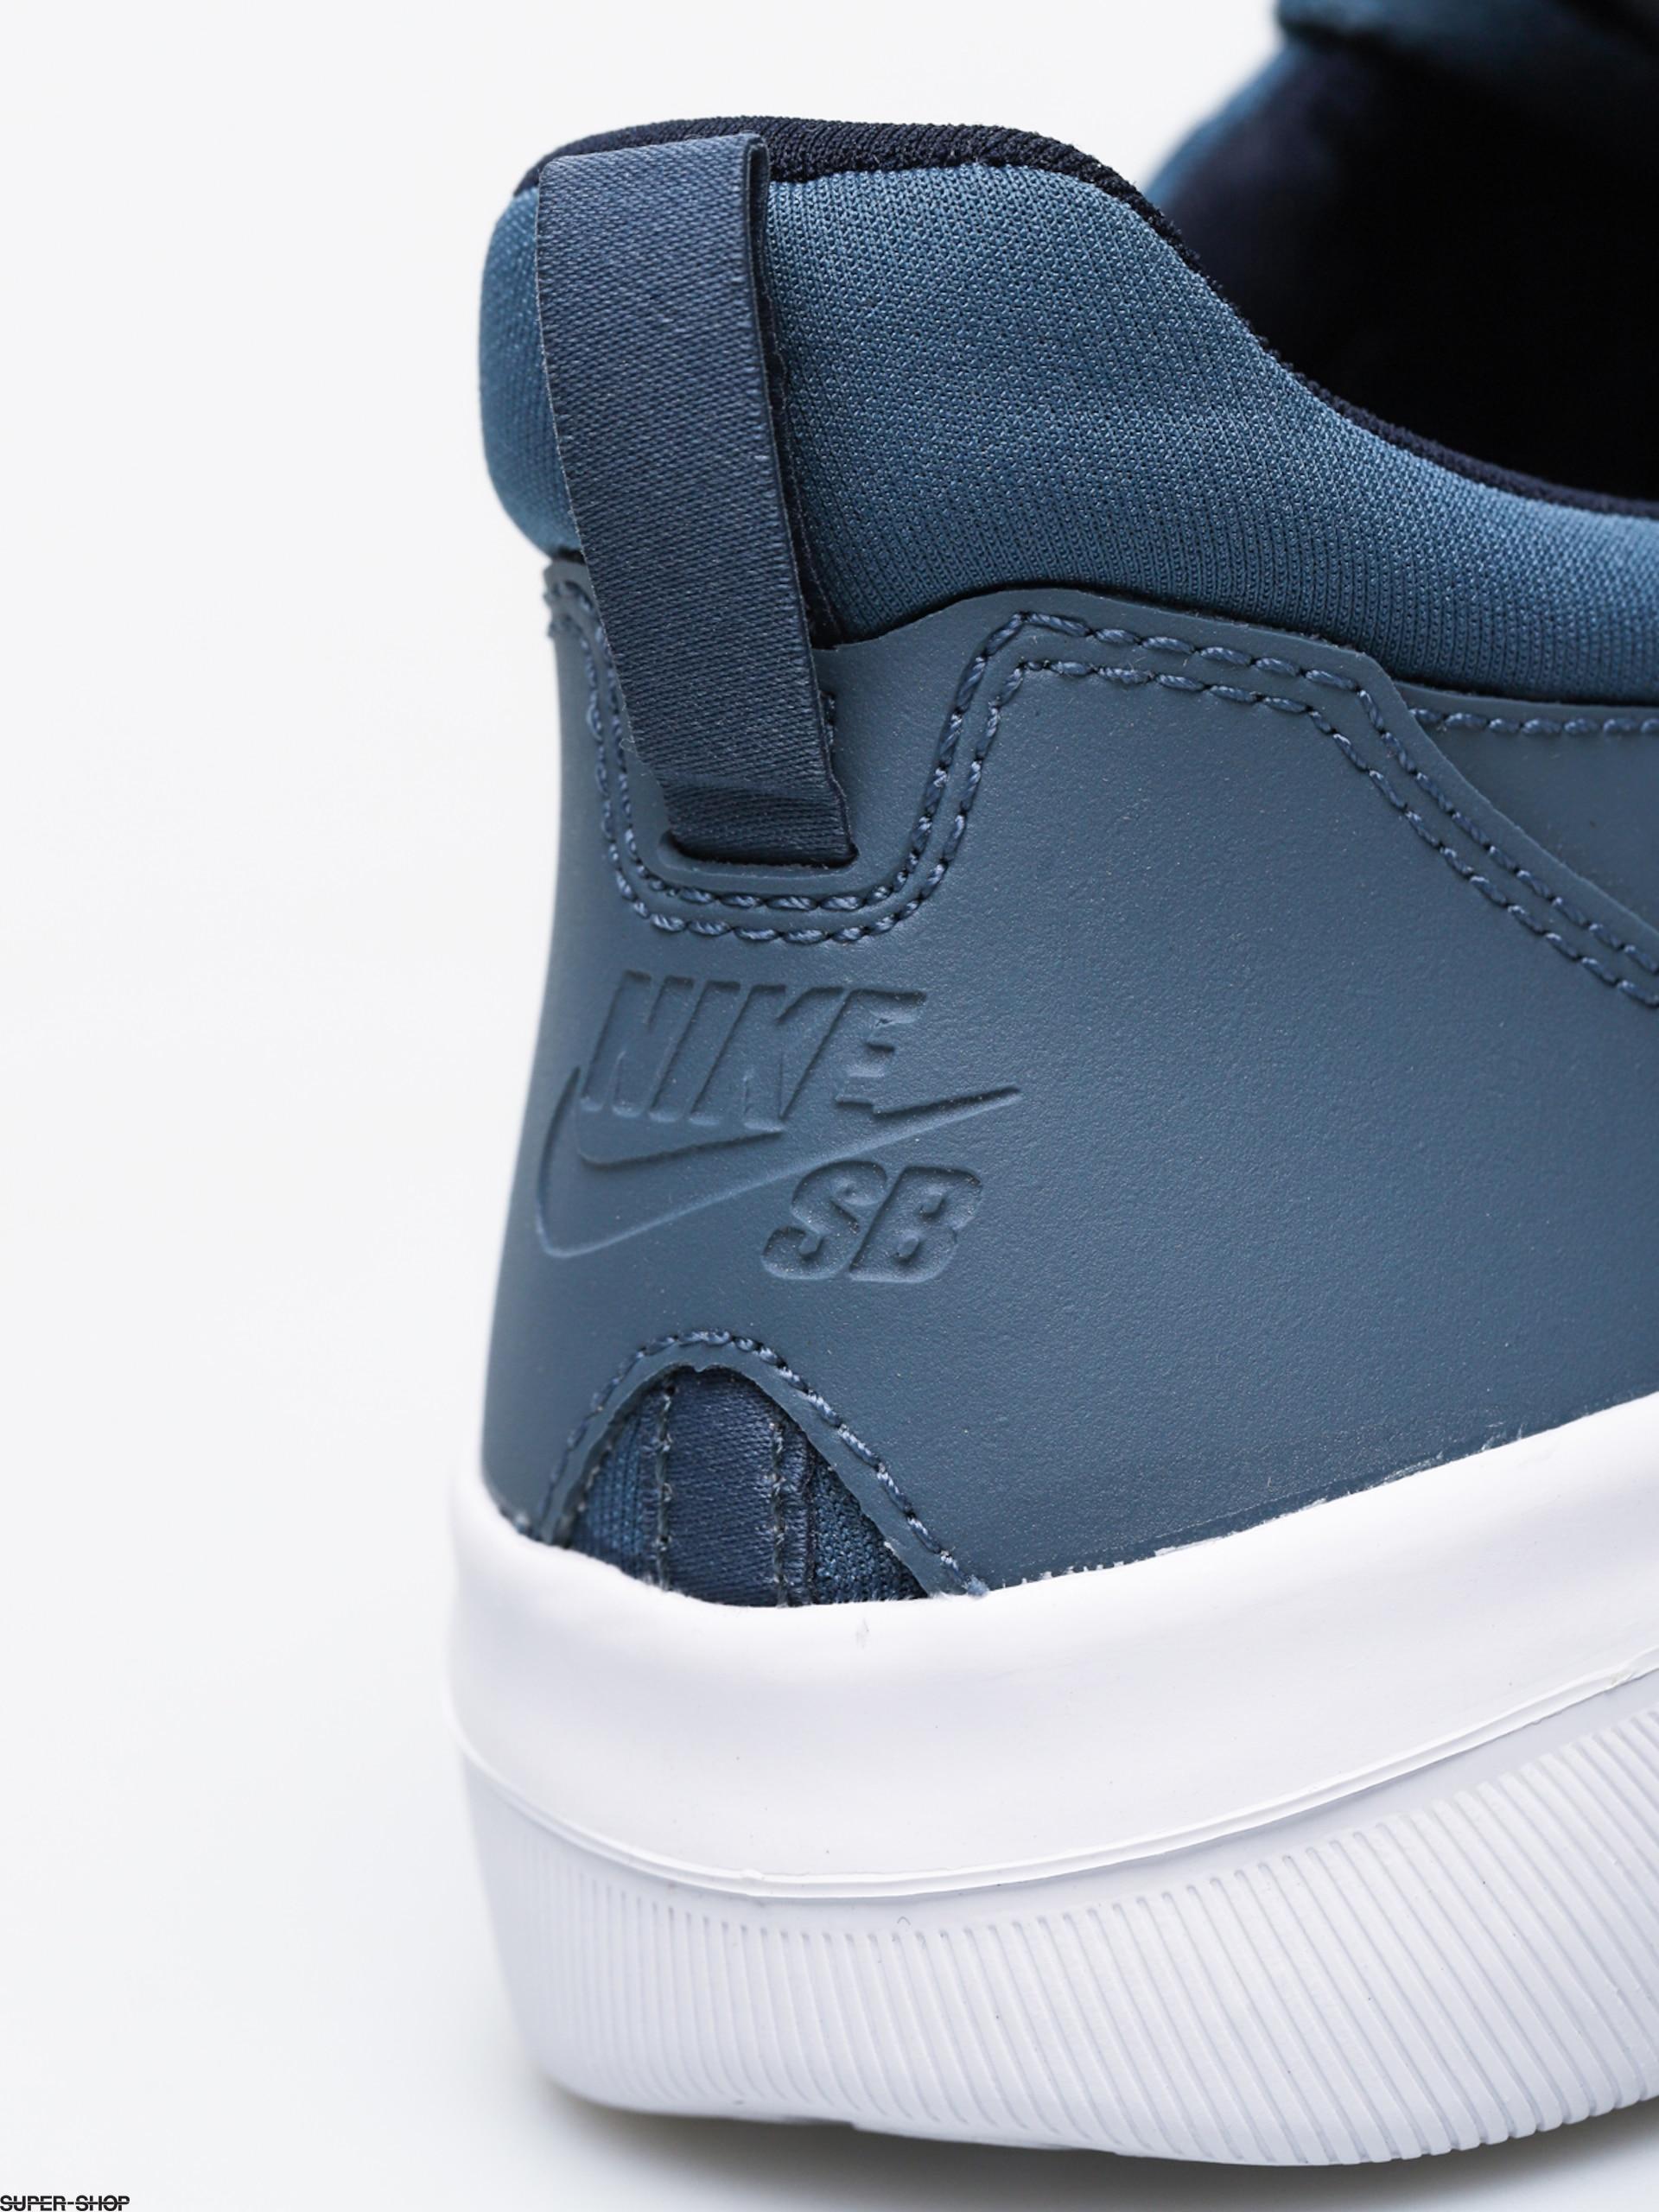 6855c3348718 Nike SB Nyjah Free Shoes (thunderstorm white obsidian)